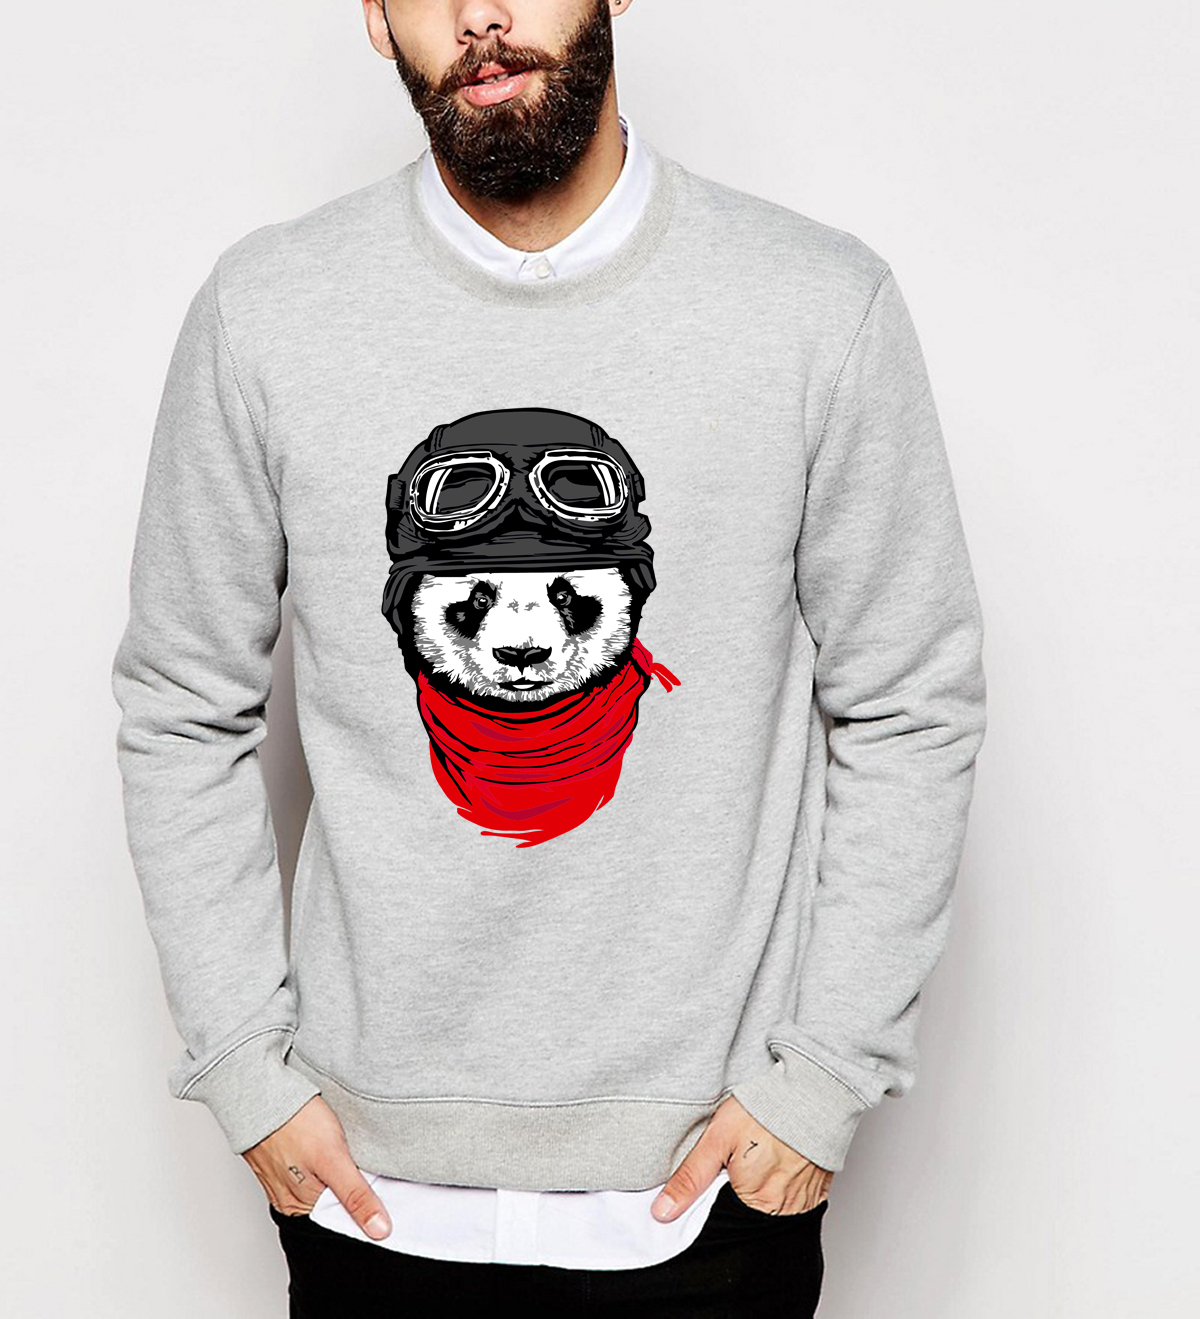 The Adventurer Cat Panda print hoodies men 2019 fall winter fashion brand sweatshirts male hip hop harajuku tracksuits